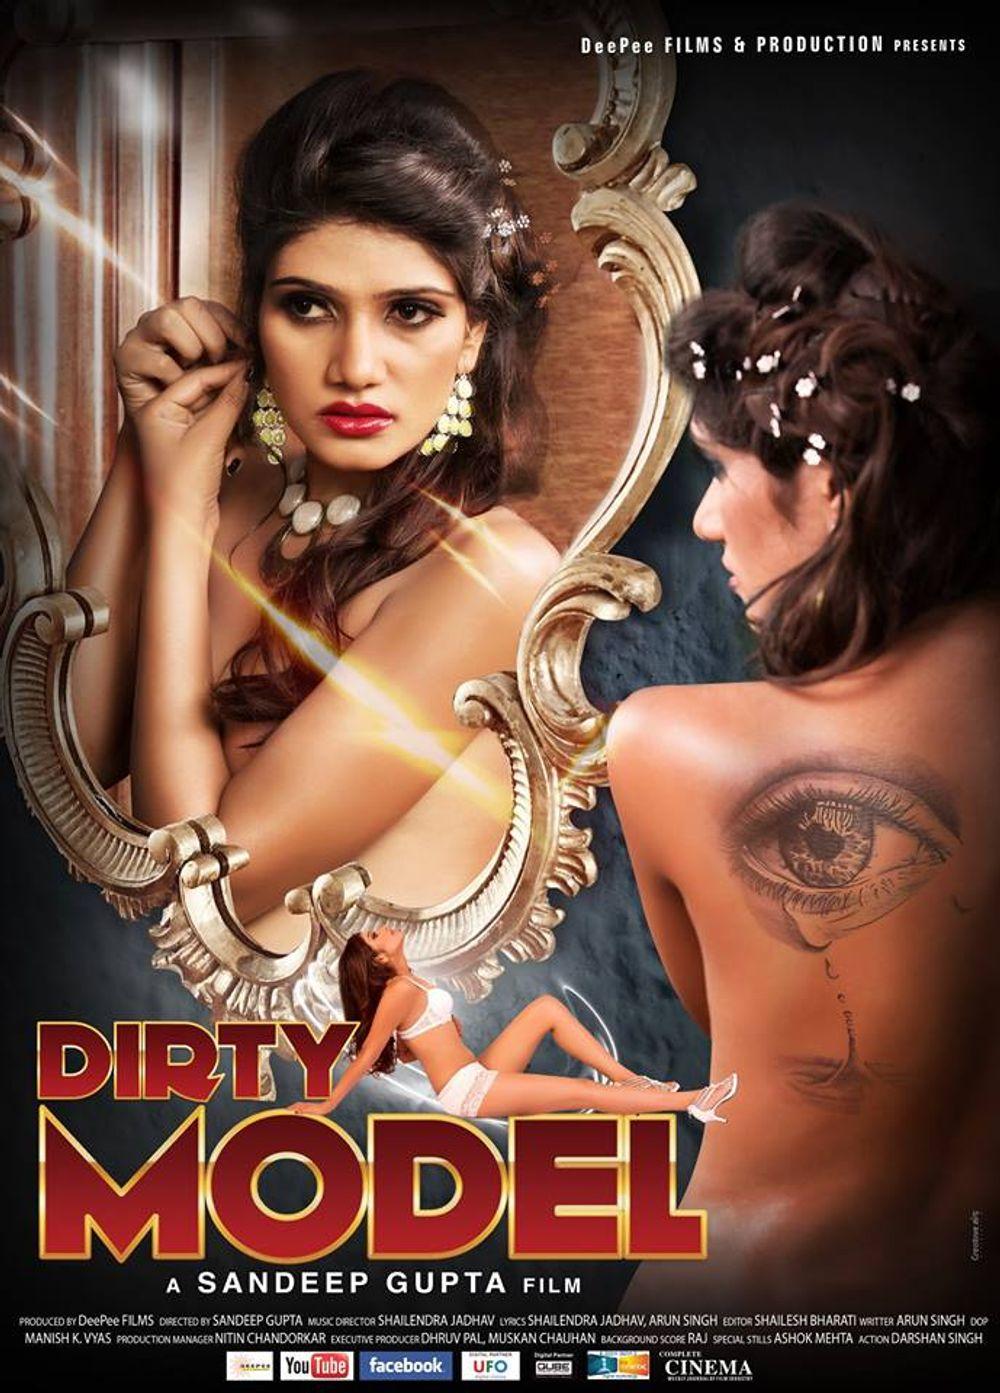 Dirty Model (2015) [DVDRip]